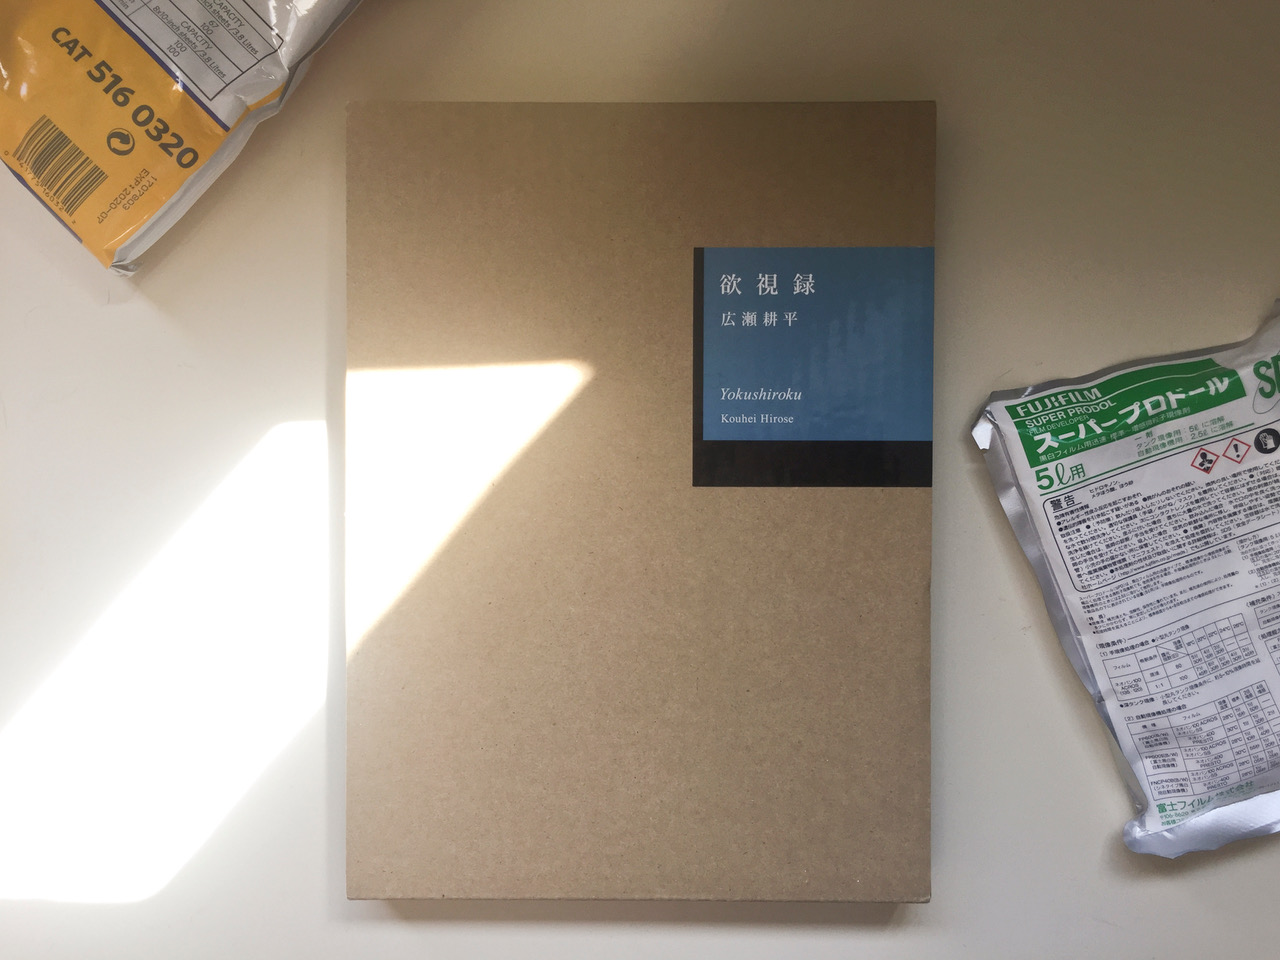 Jesse's Book Review – Yokushiroku by Kouhei Hirose